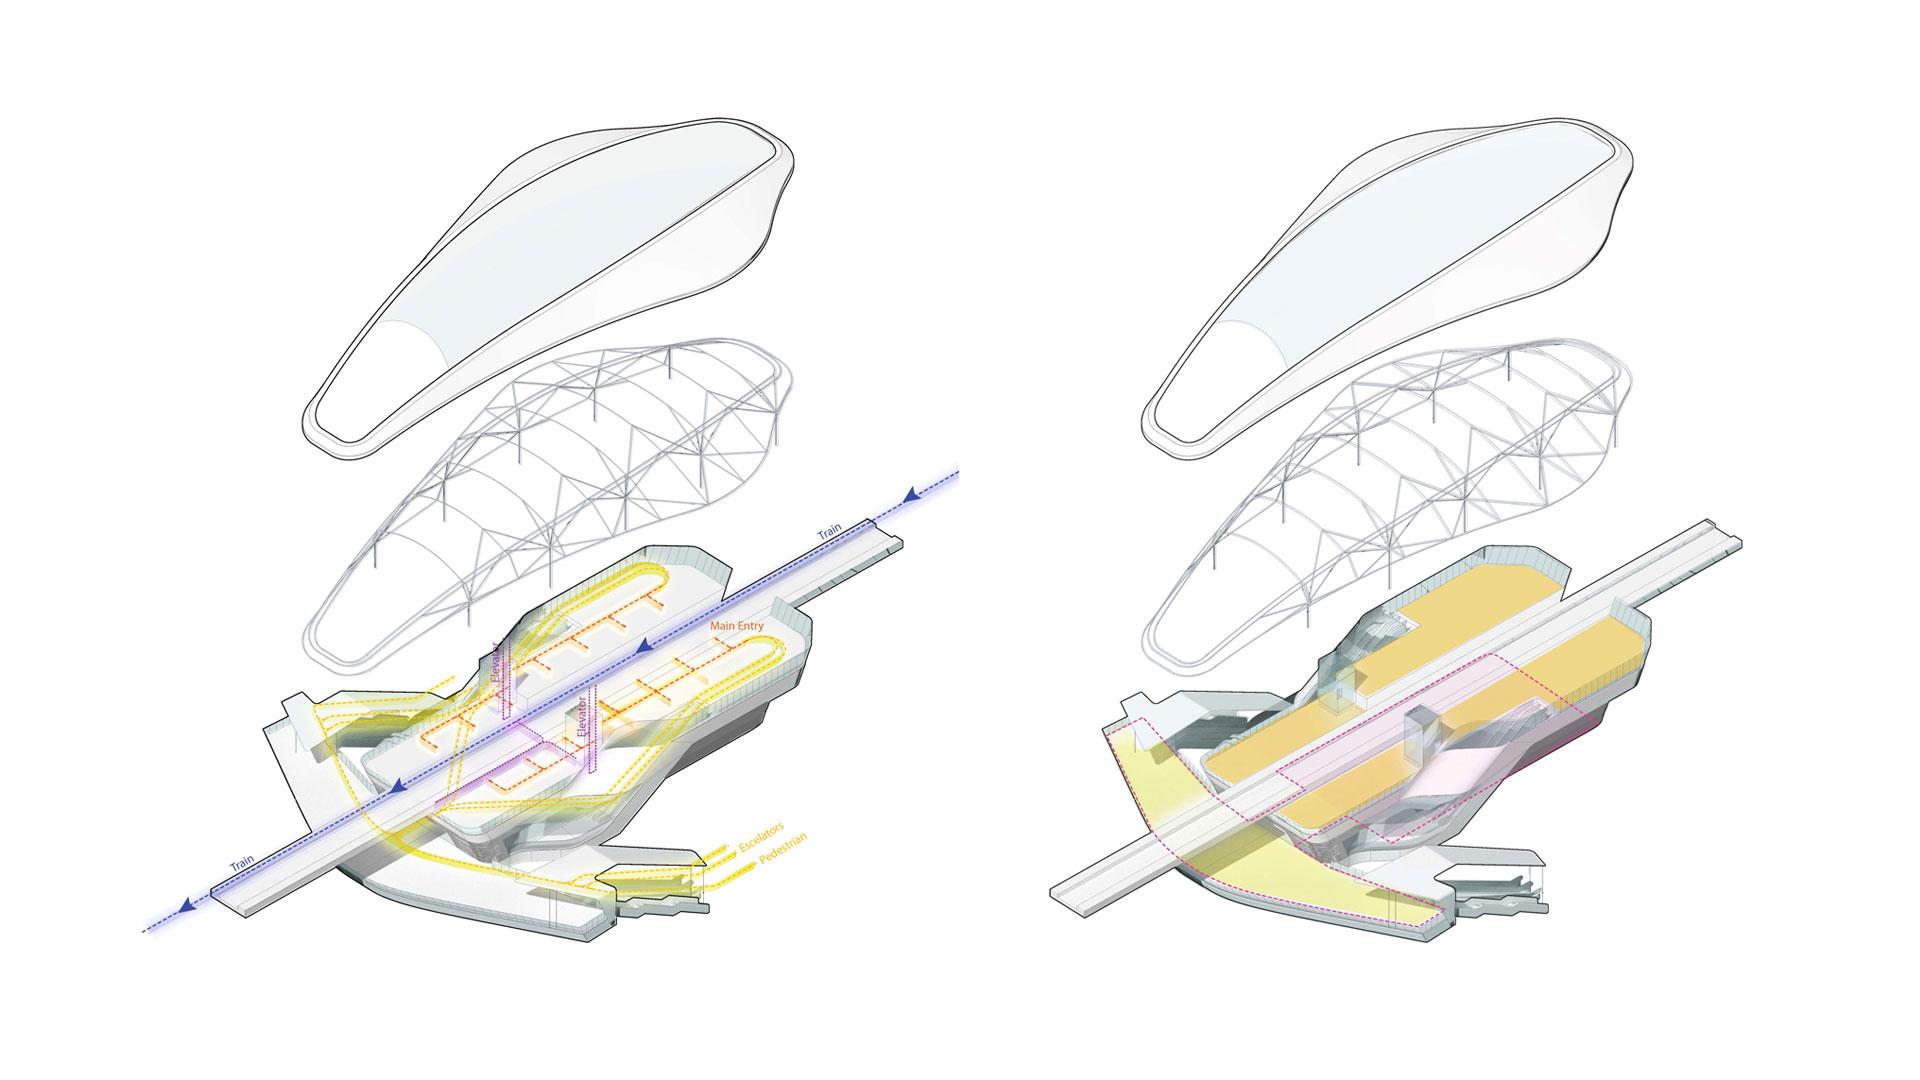 maglev train diagram vl radio wiring urban transit lassa architects